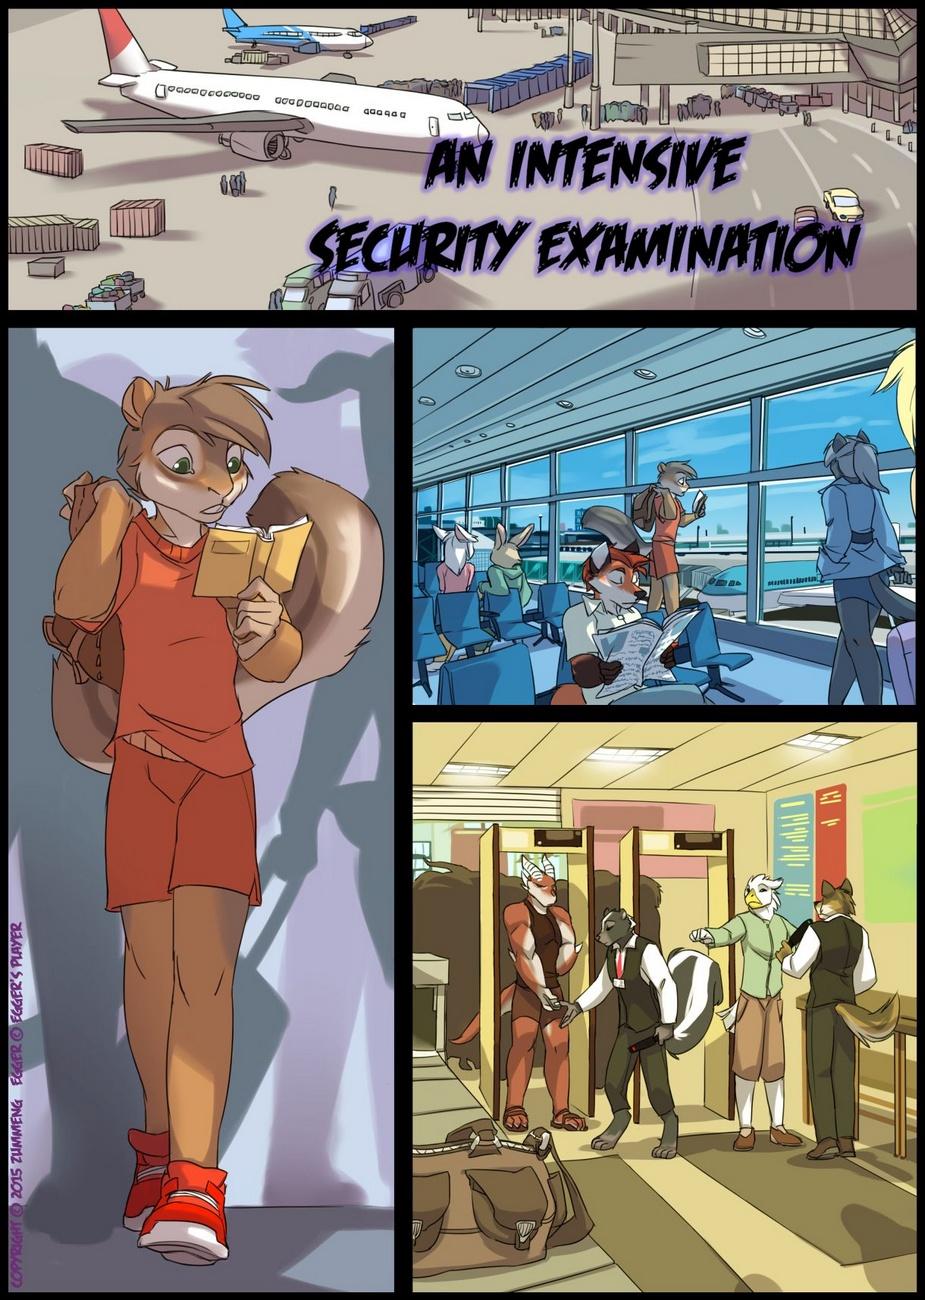 An Intensive Security Examination